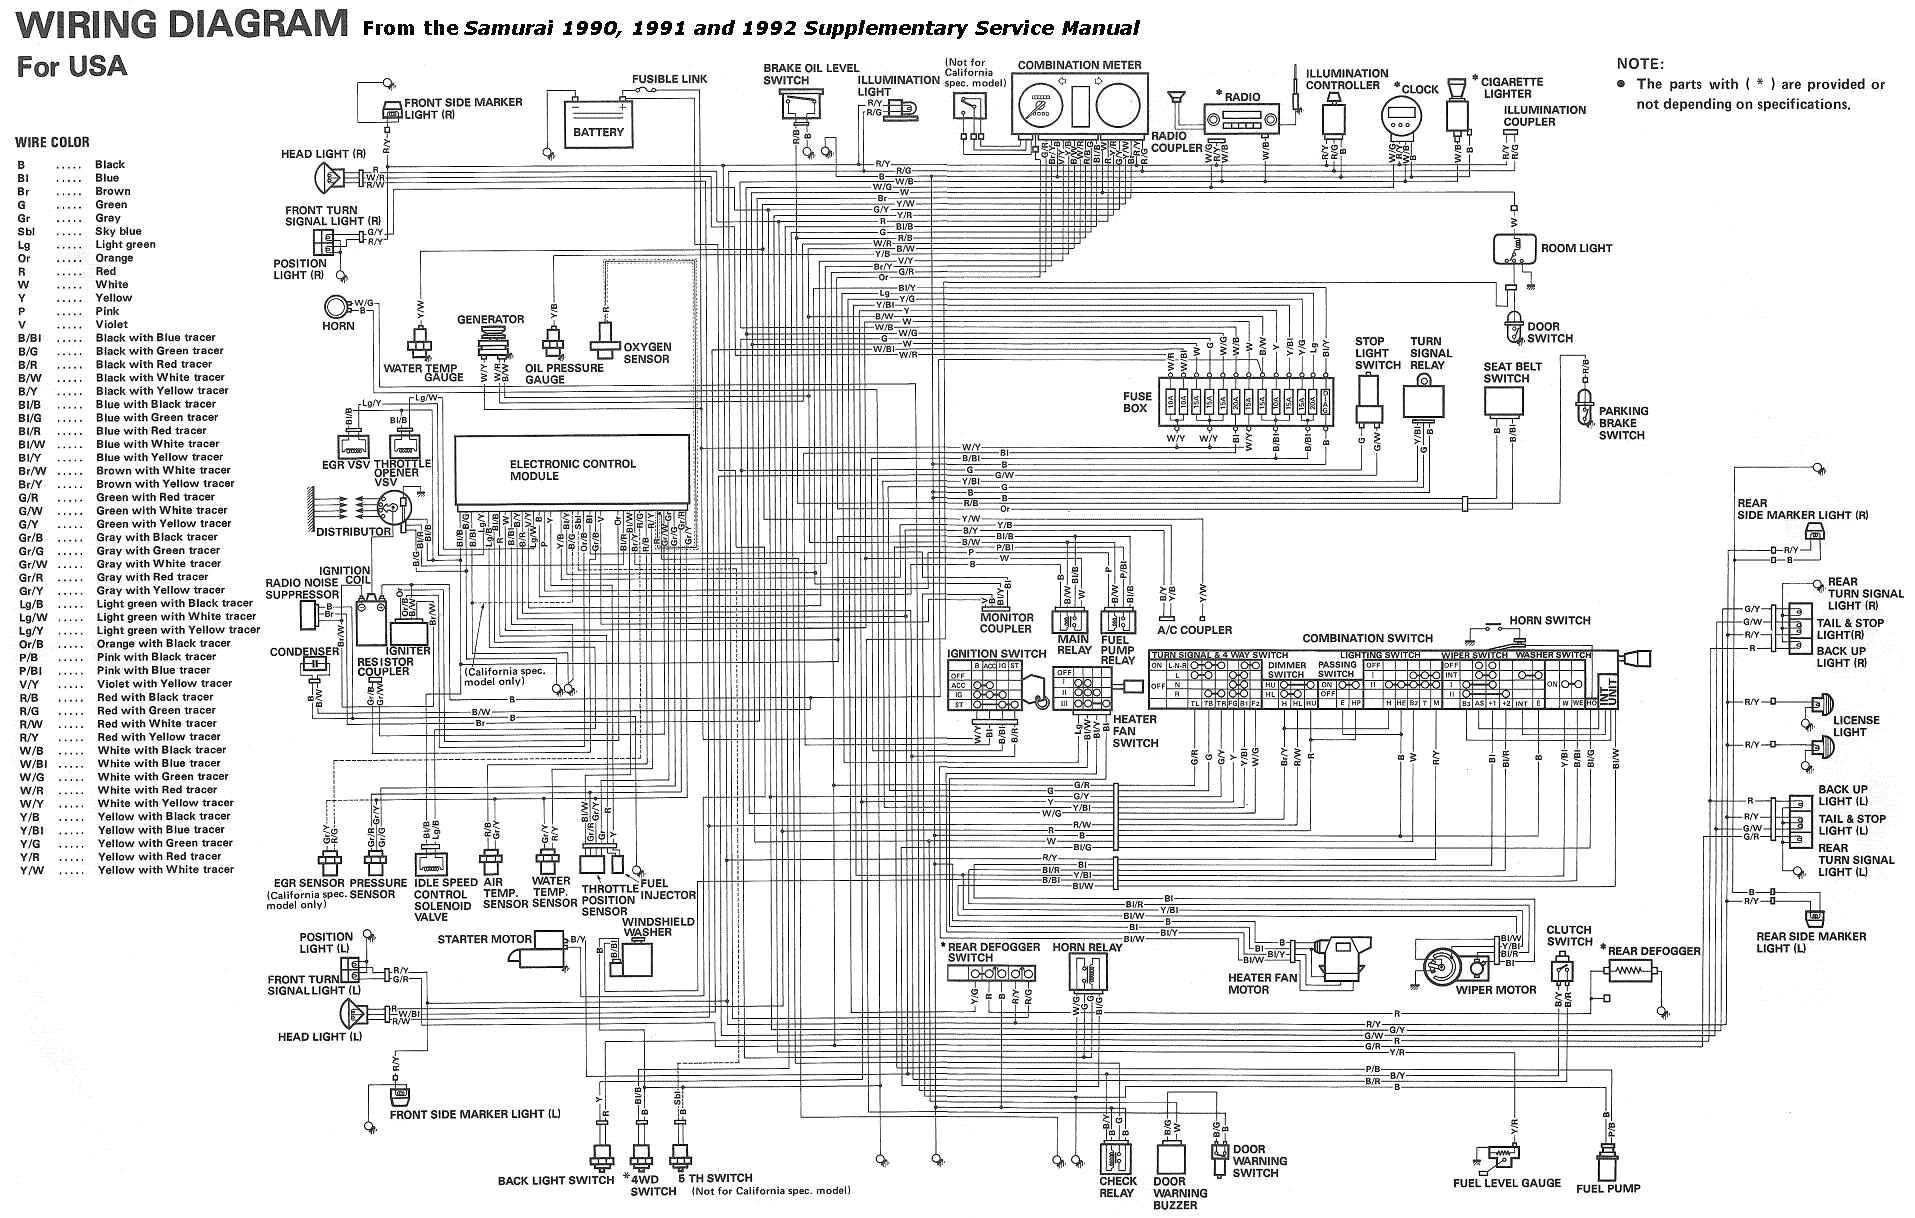 suzuki wiring diagrams wiring diagram toolbox suzuki every wiring diagrams suzuki every wiring diagram